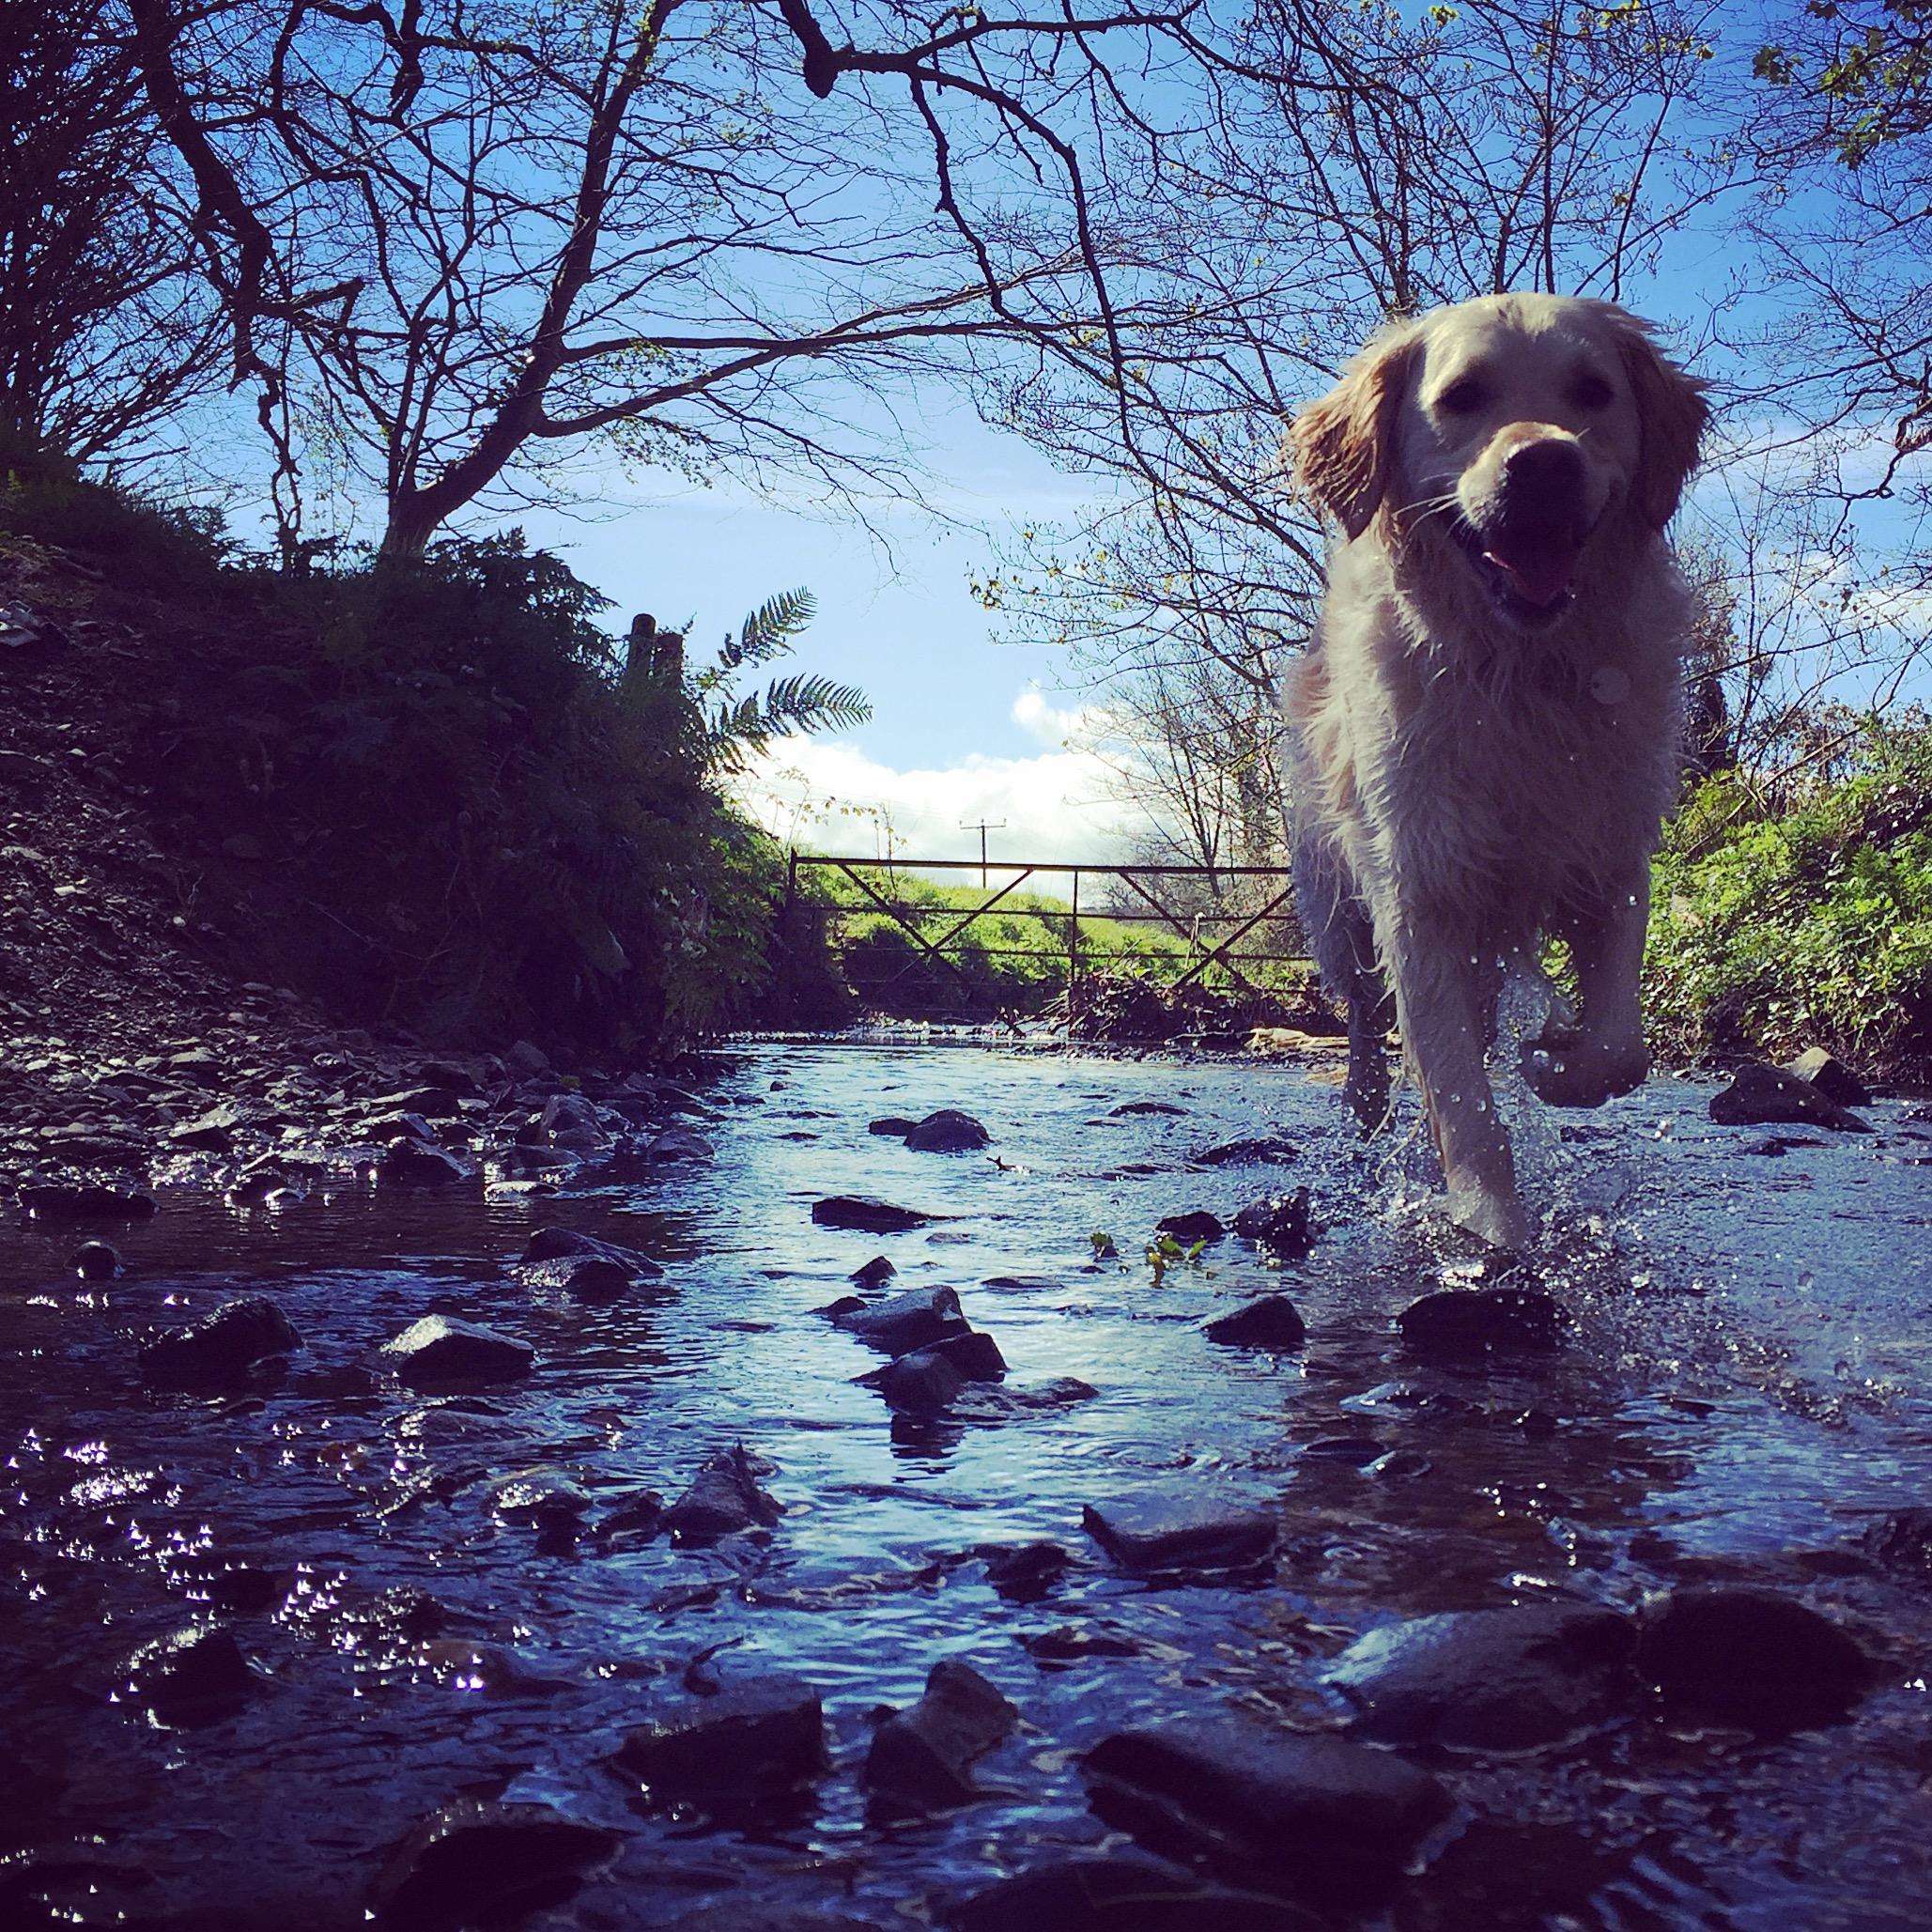 river_bridge_happy_dog_country_helens_bay_to_crawfordsburn_roadtrip_coast_ni_explorer_niexplorer_northern_ireland_blog.jpg